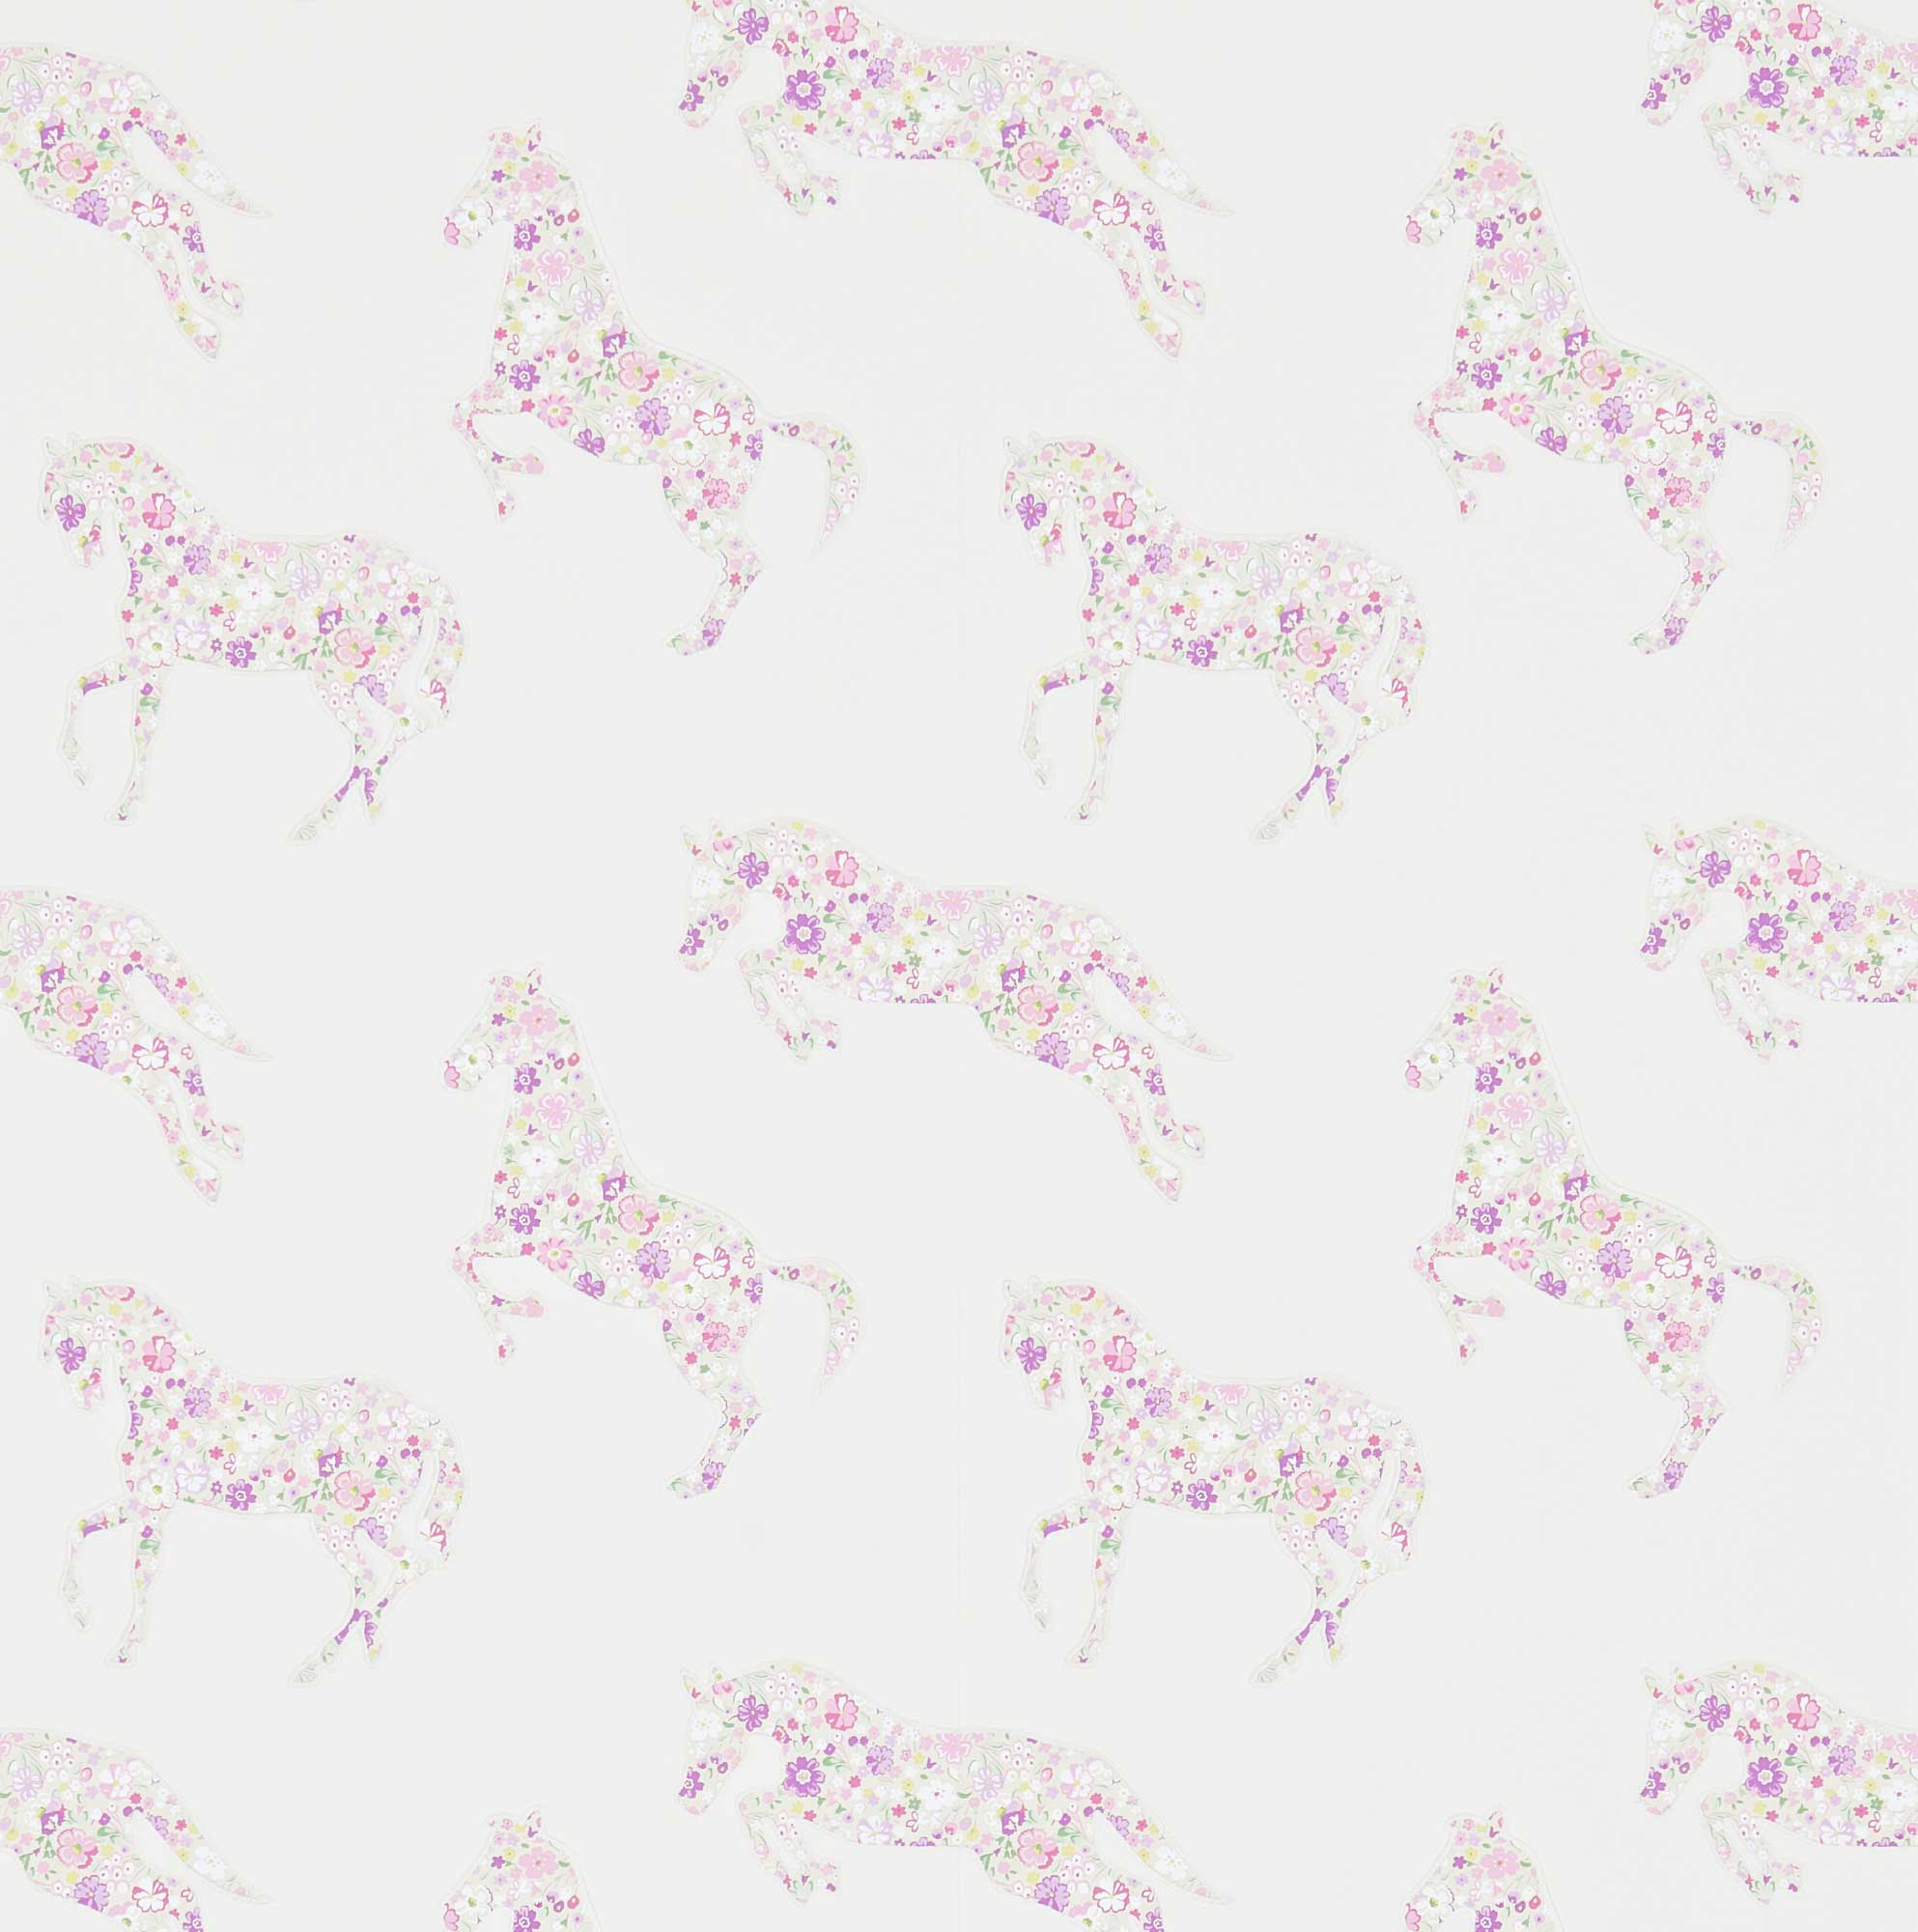 Kinderzimmer Tapeten Jungen : Tapeten Kinderzimmer – Pferde, bunte Farben